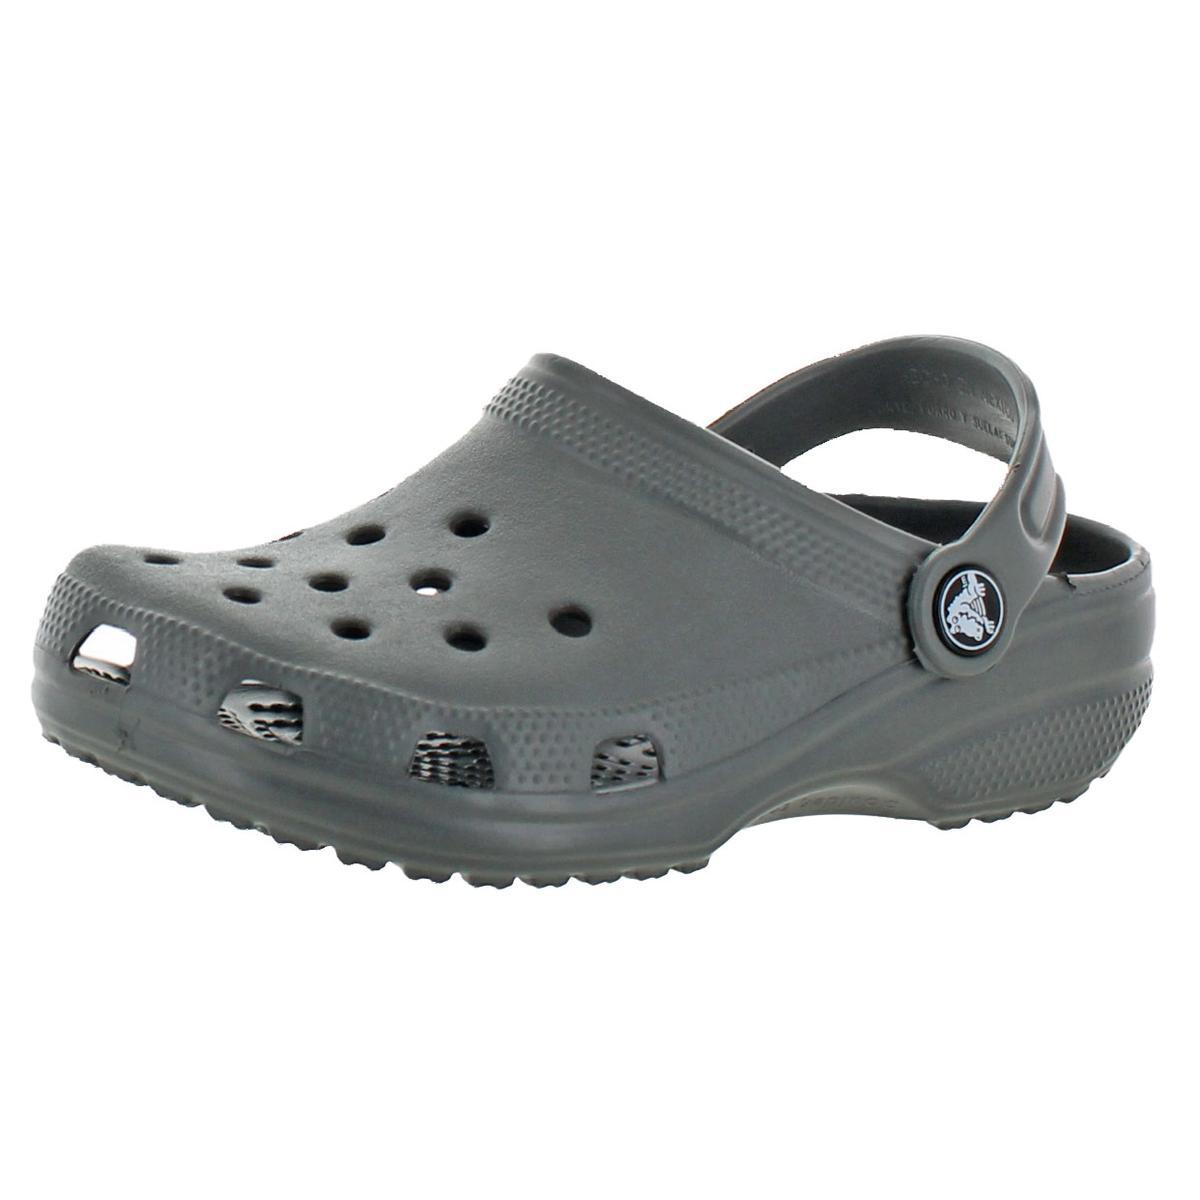 e605af9aa1 BHFO: Crocs Unisex Kids Classic Croslite Clog Shoes | Rakuten.com